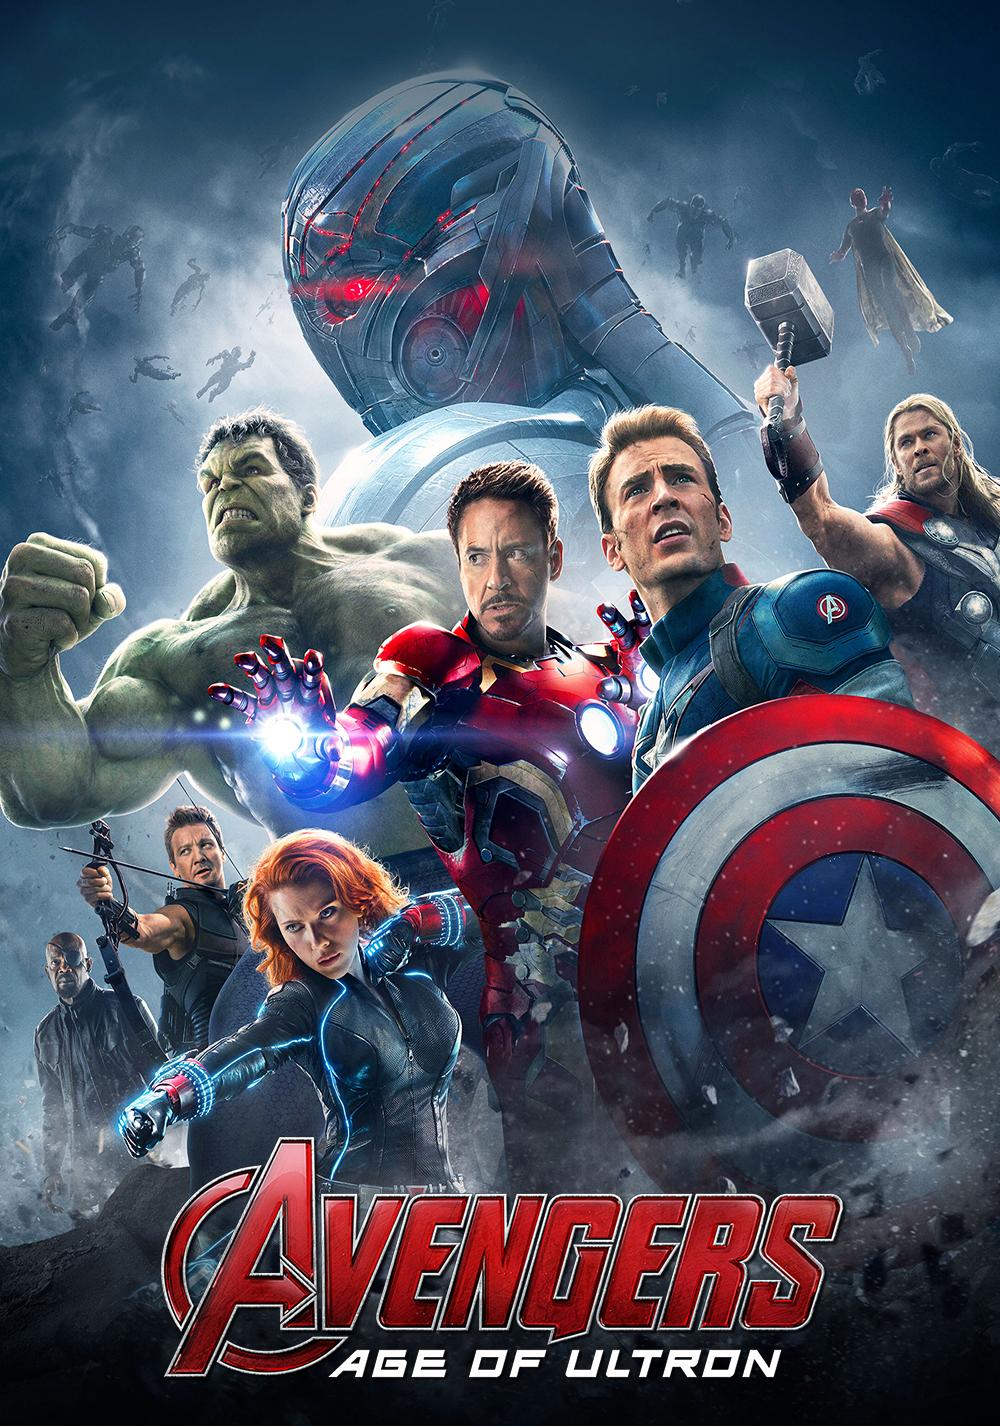 Avengers Age Of Ultron Kinox.To